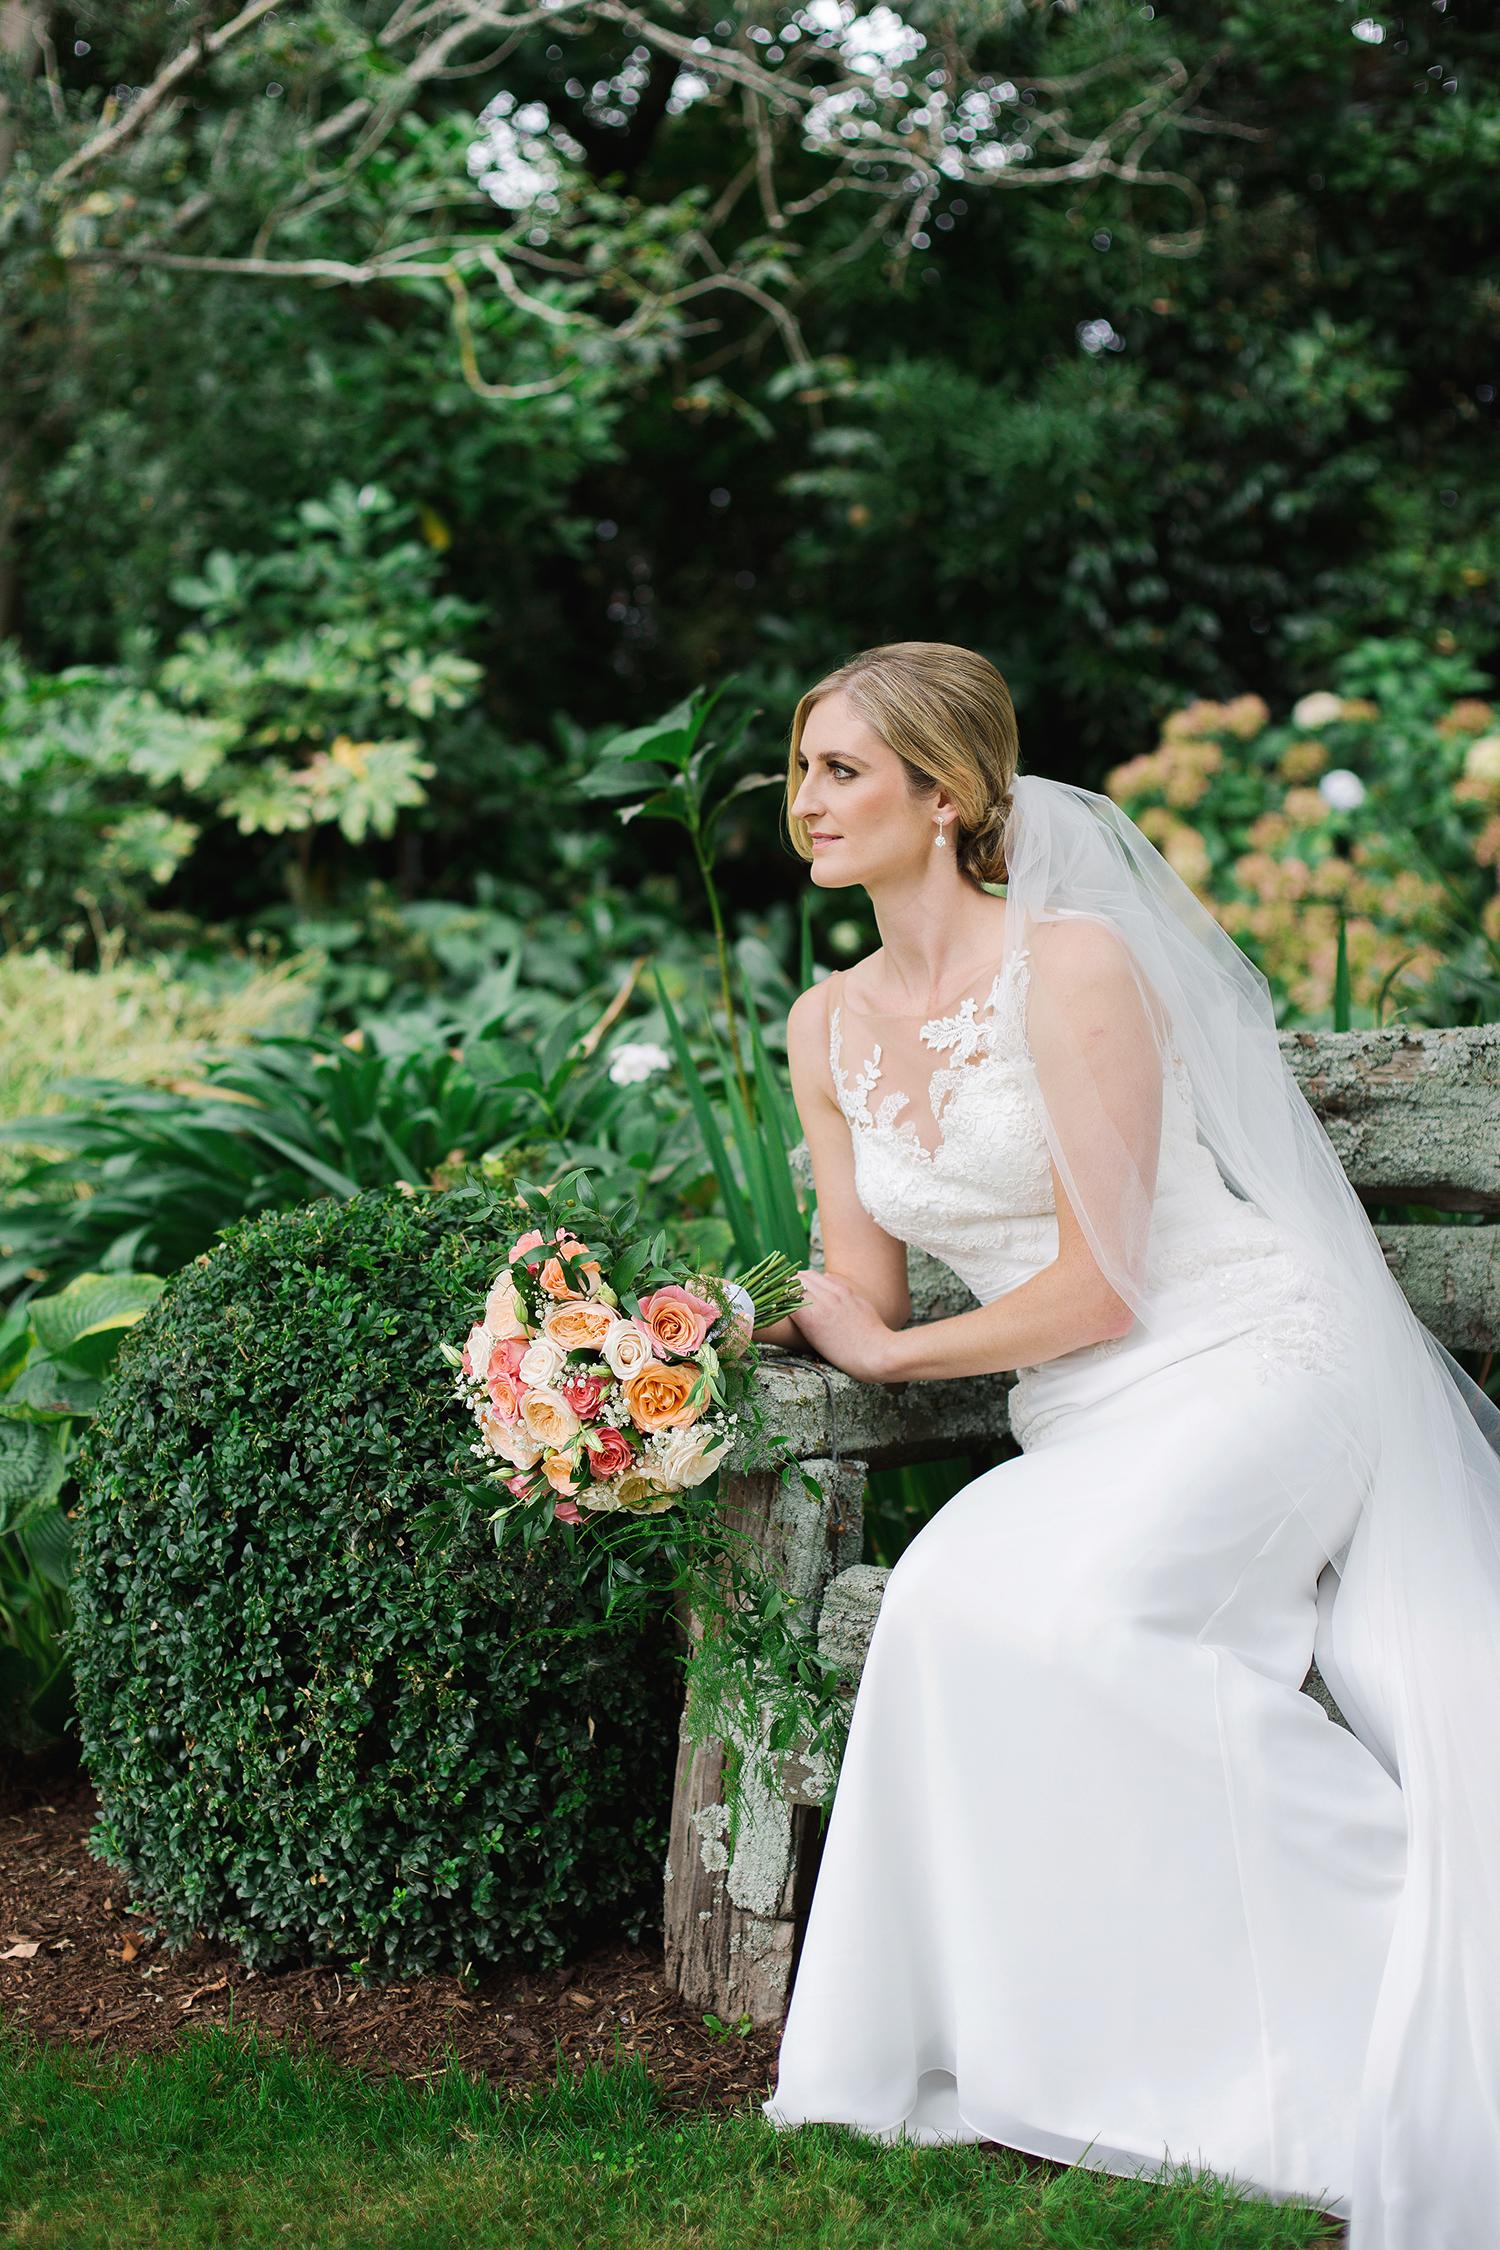 Toni-Larsen-Katie+Willy-Wedding-10.jpg